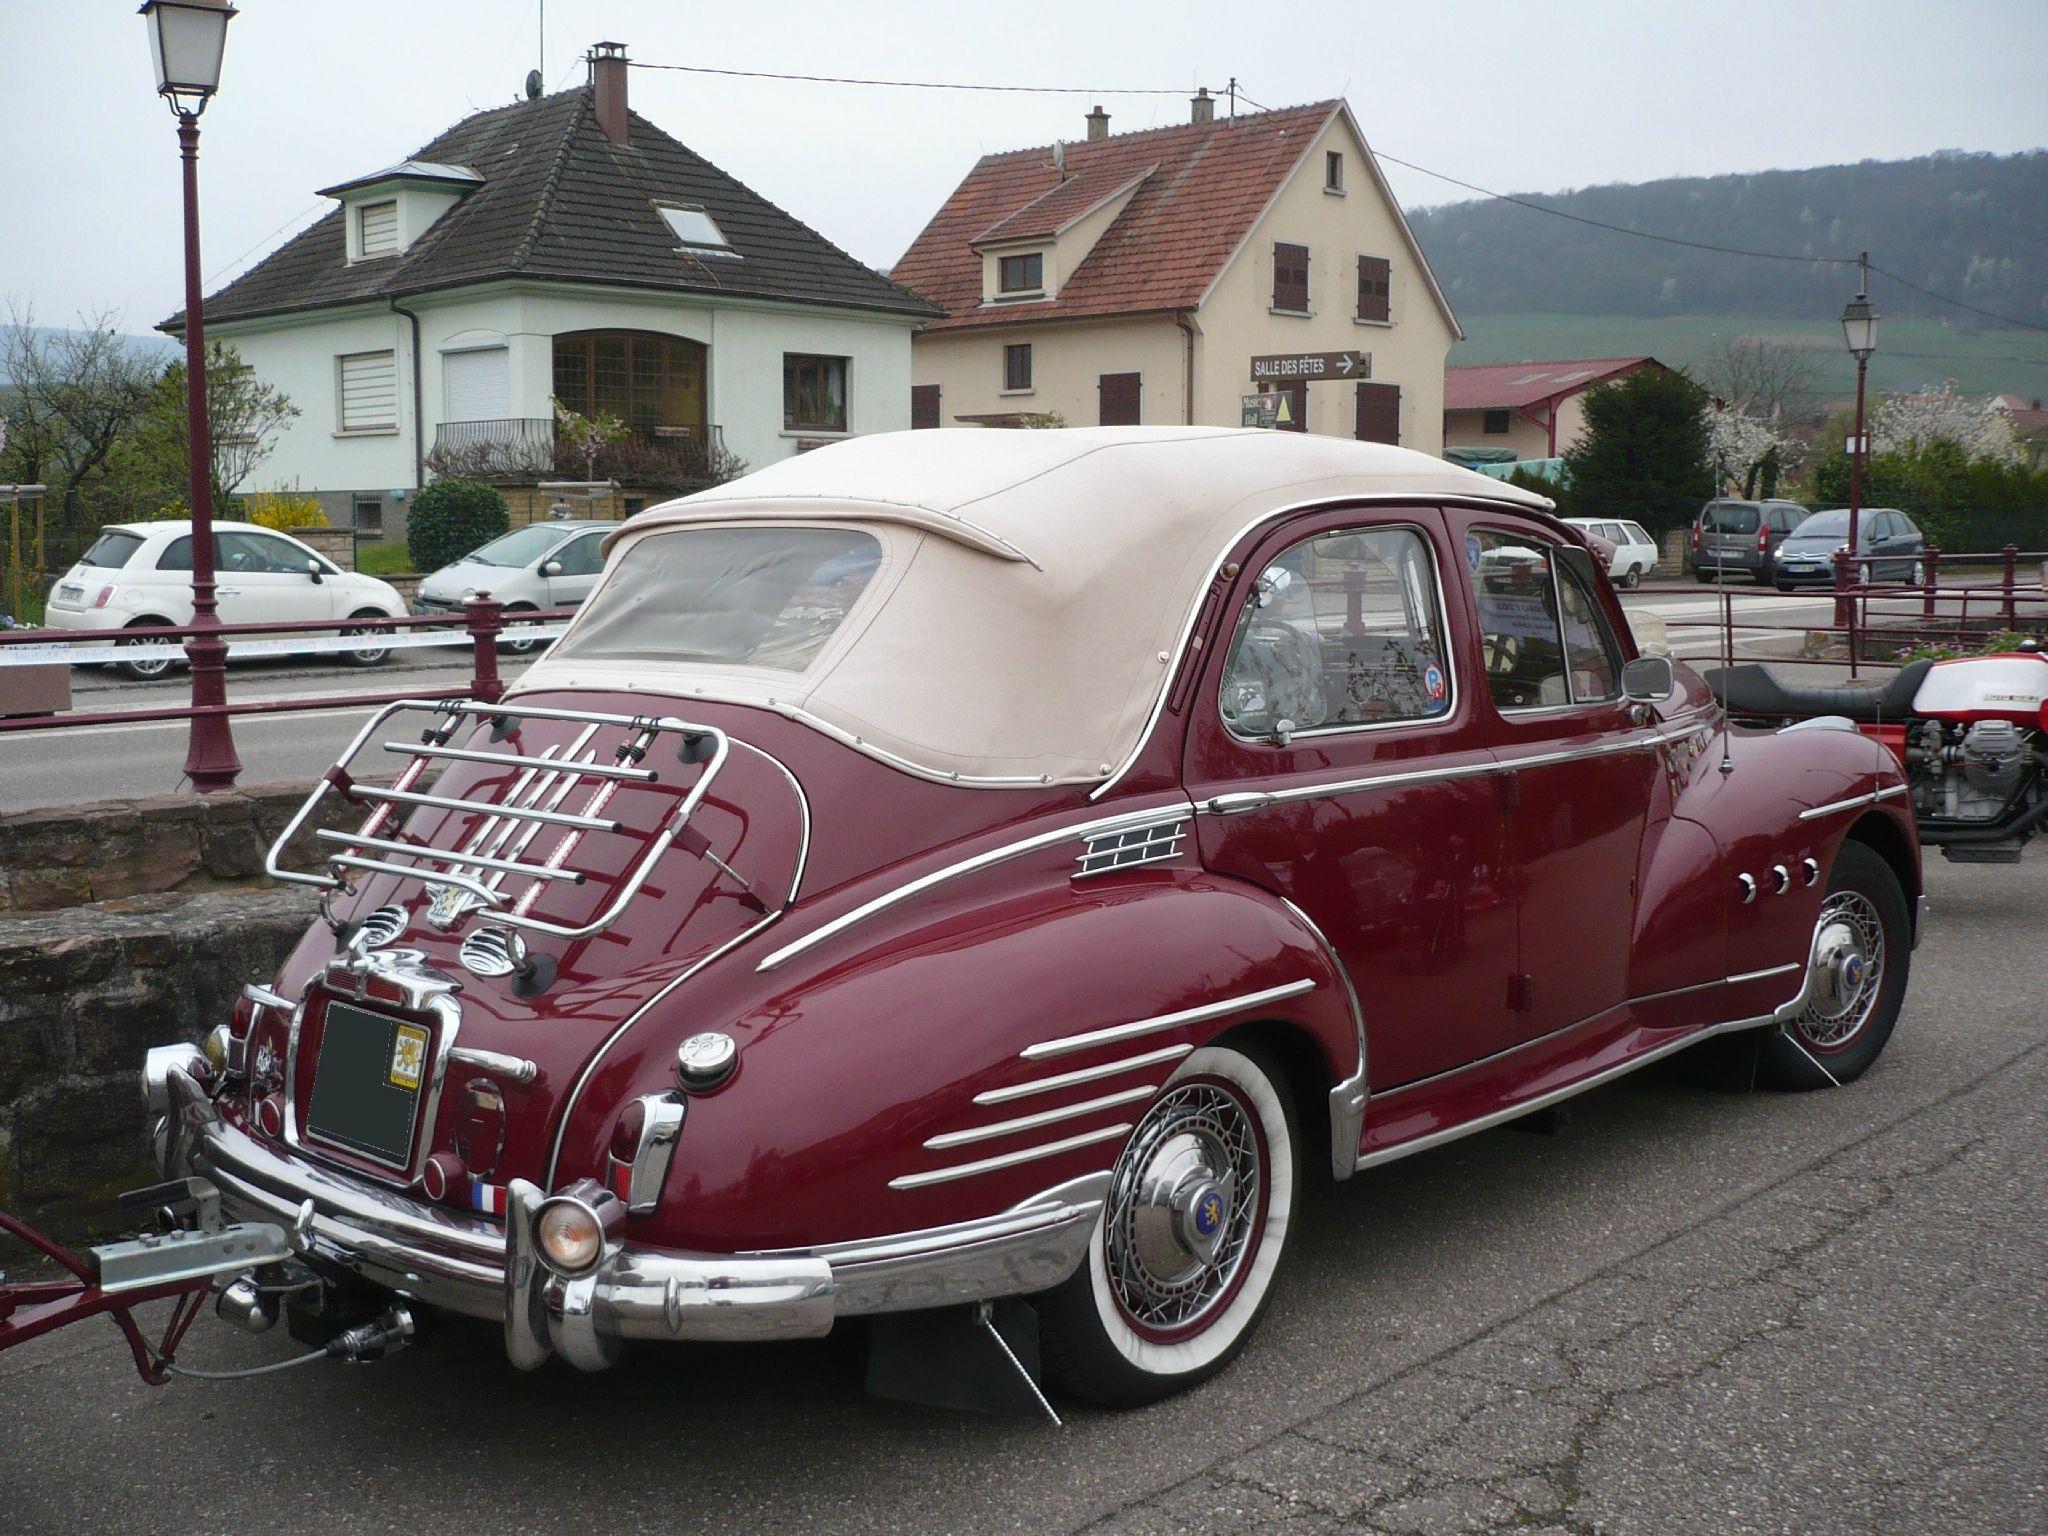 peugeot 203 berline d couvrable 1954 autres vehicules other vehicles. Black Bedroom Furniture Sets. Home Design Ideas